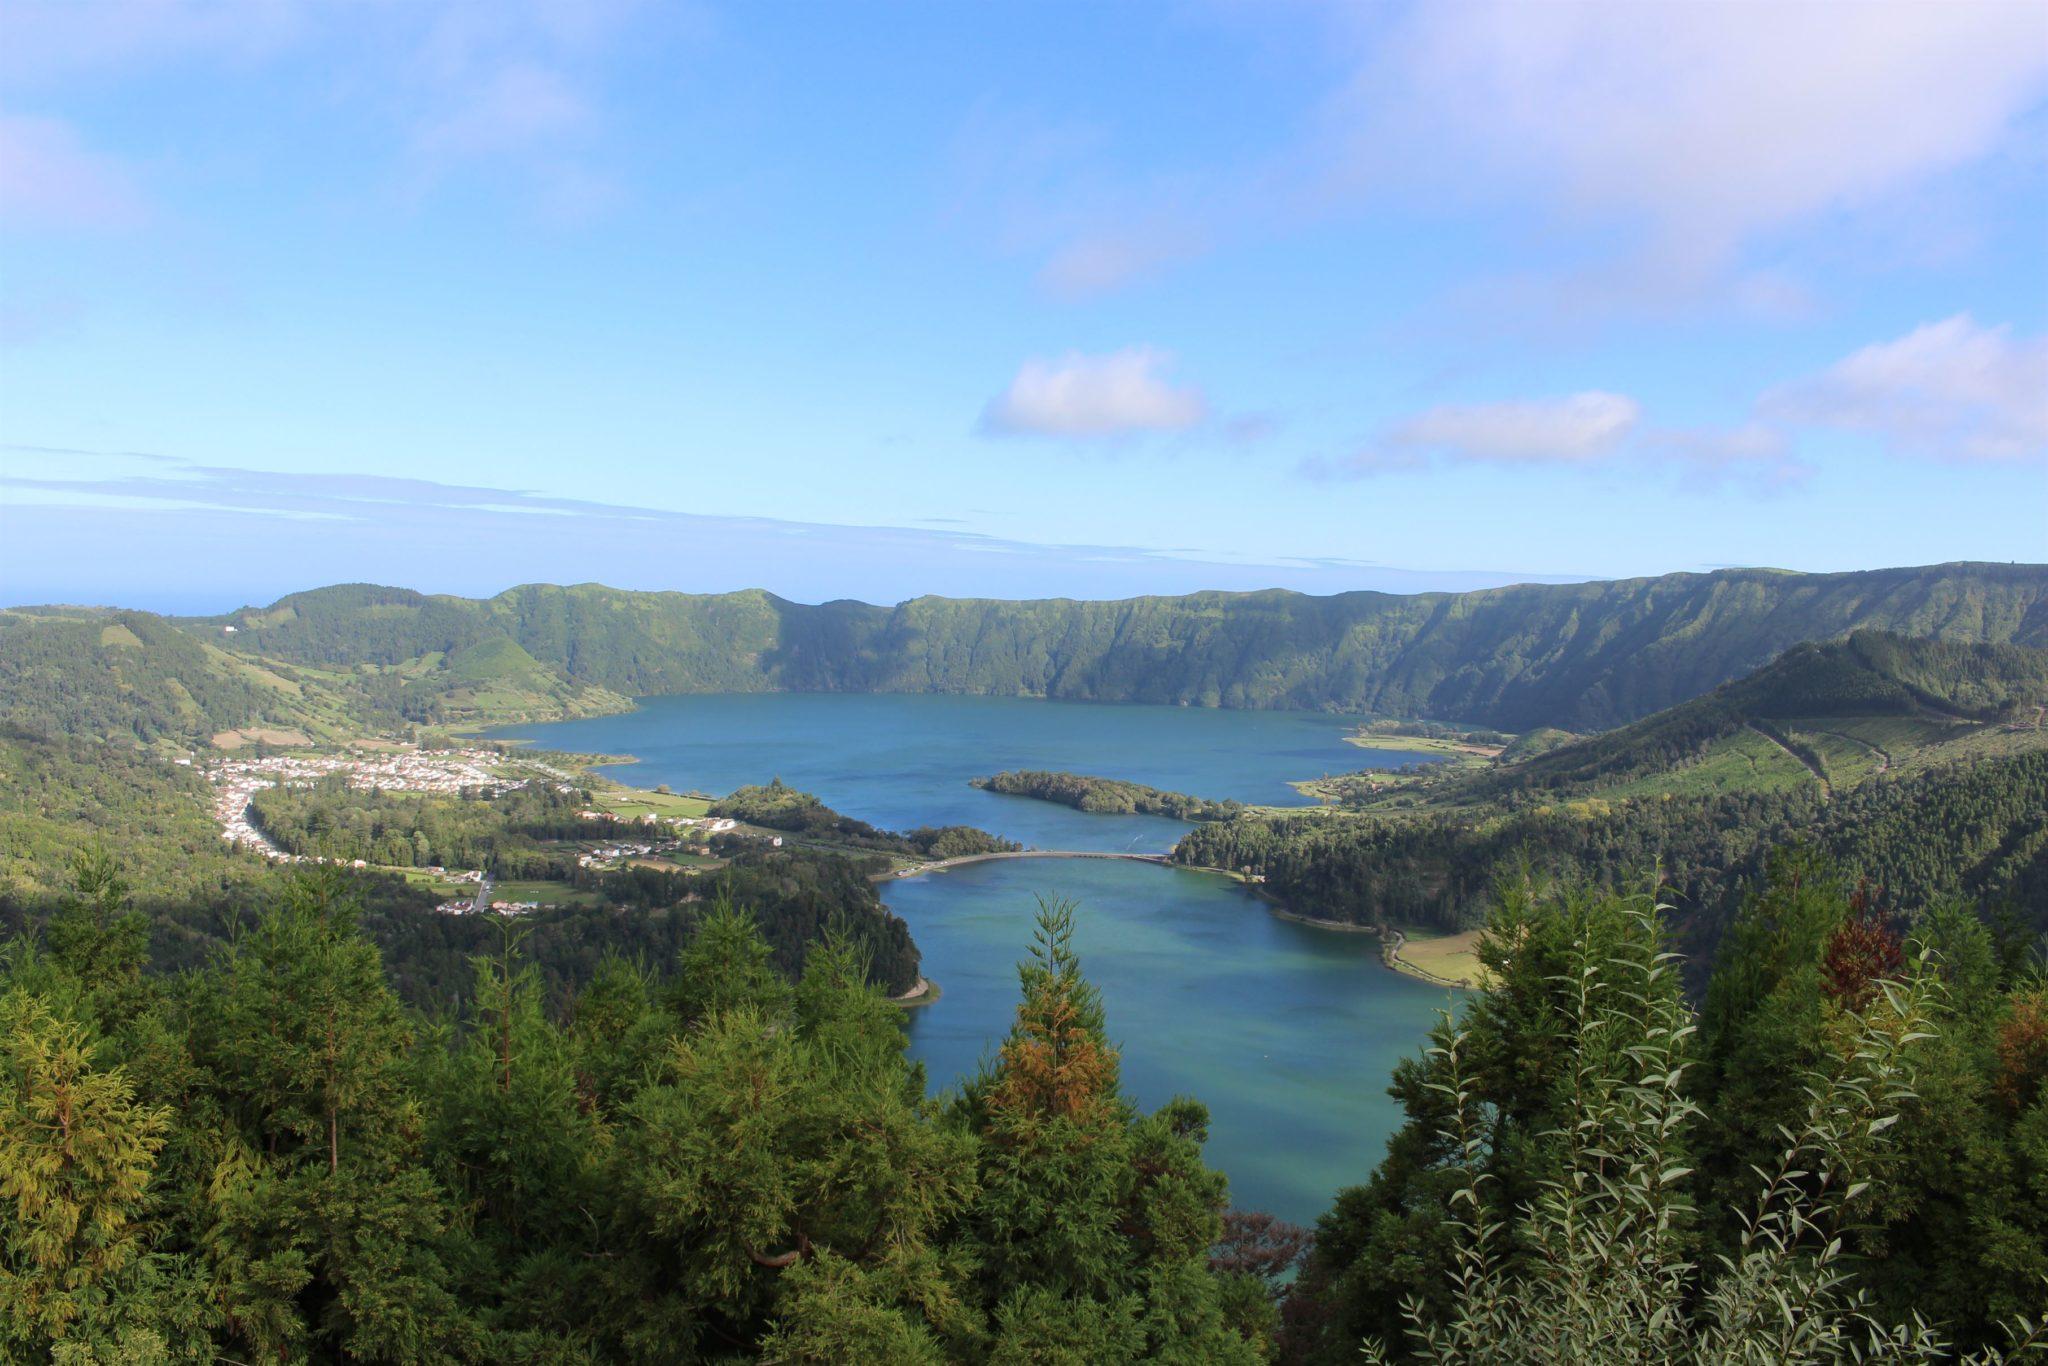 Lagoa das Sete Cidades, S. Miguel, Açores